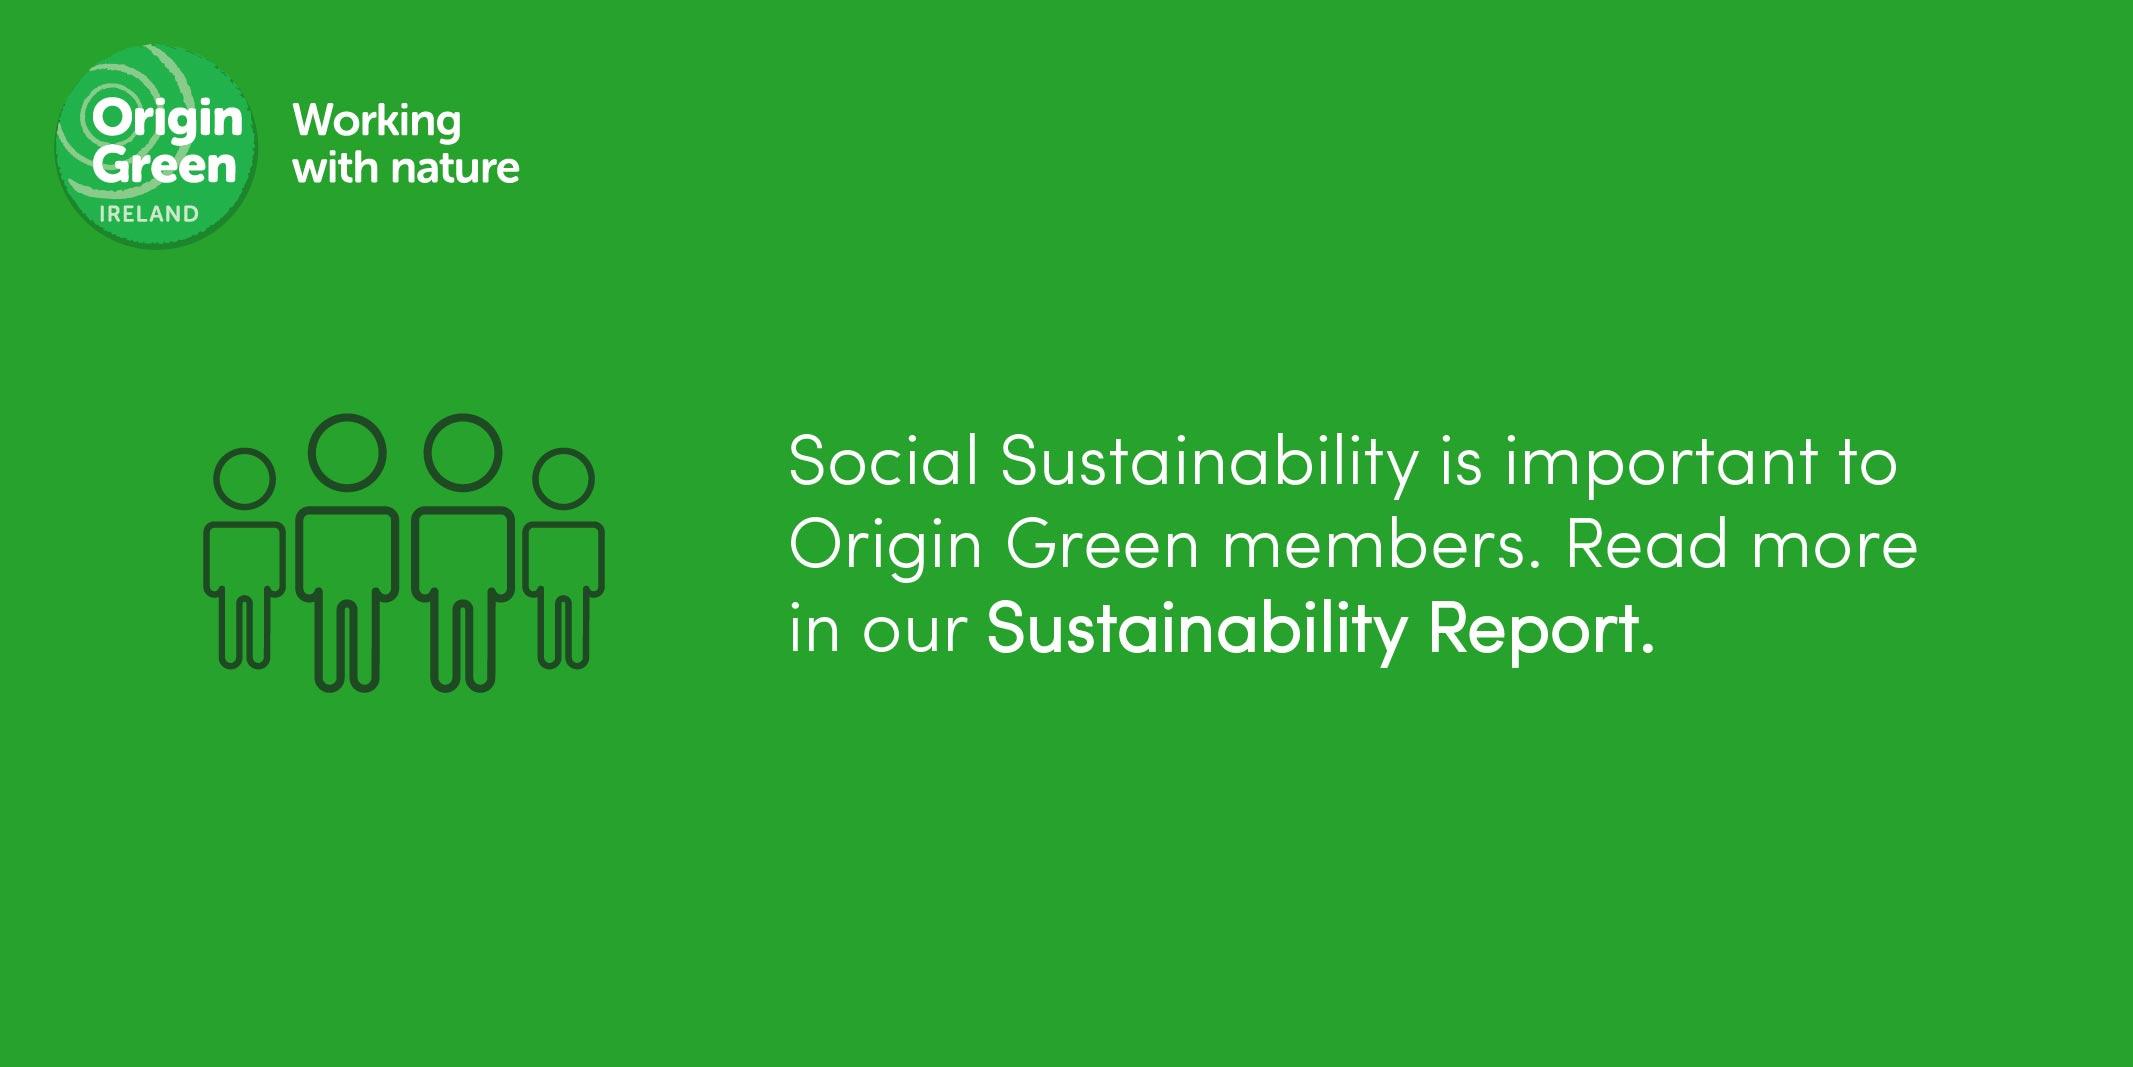 Origin-Green-Twitter-June-04.jpg